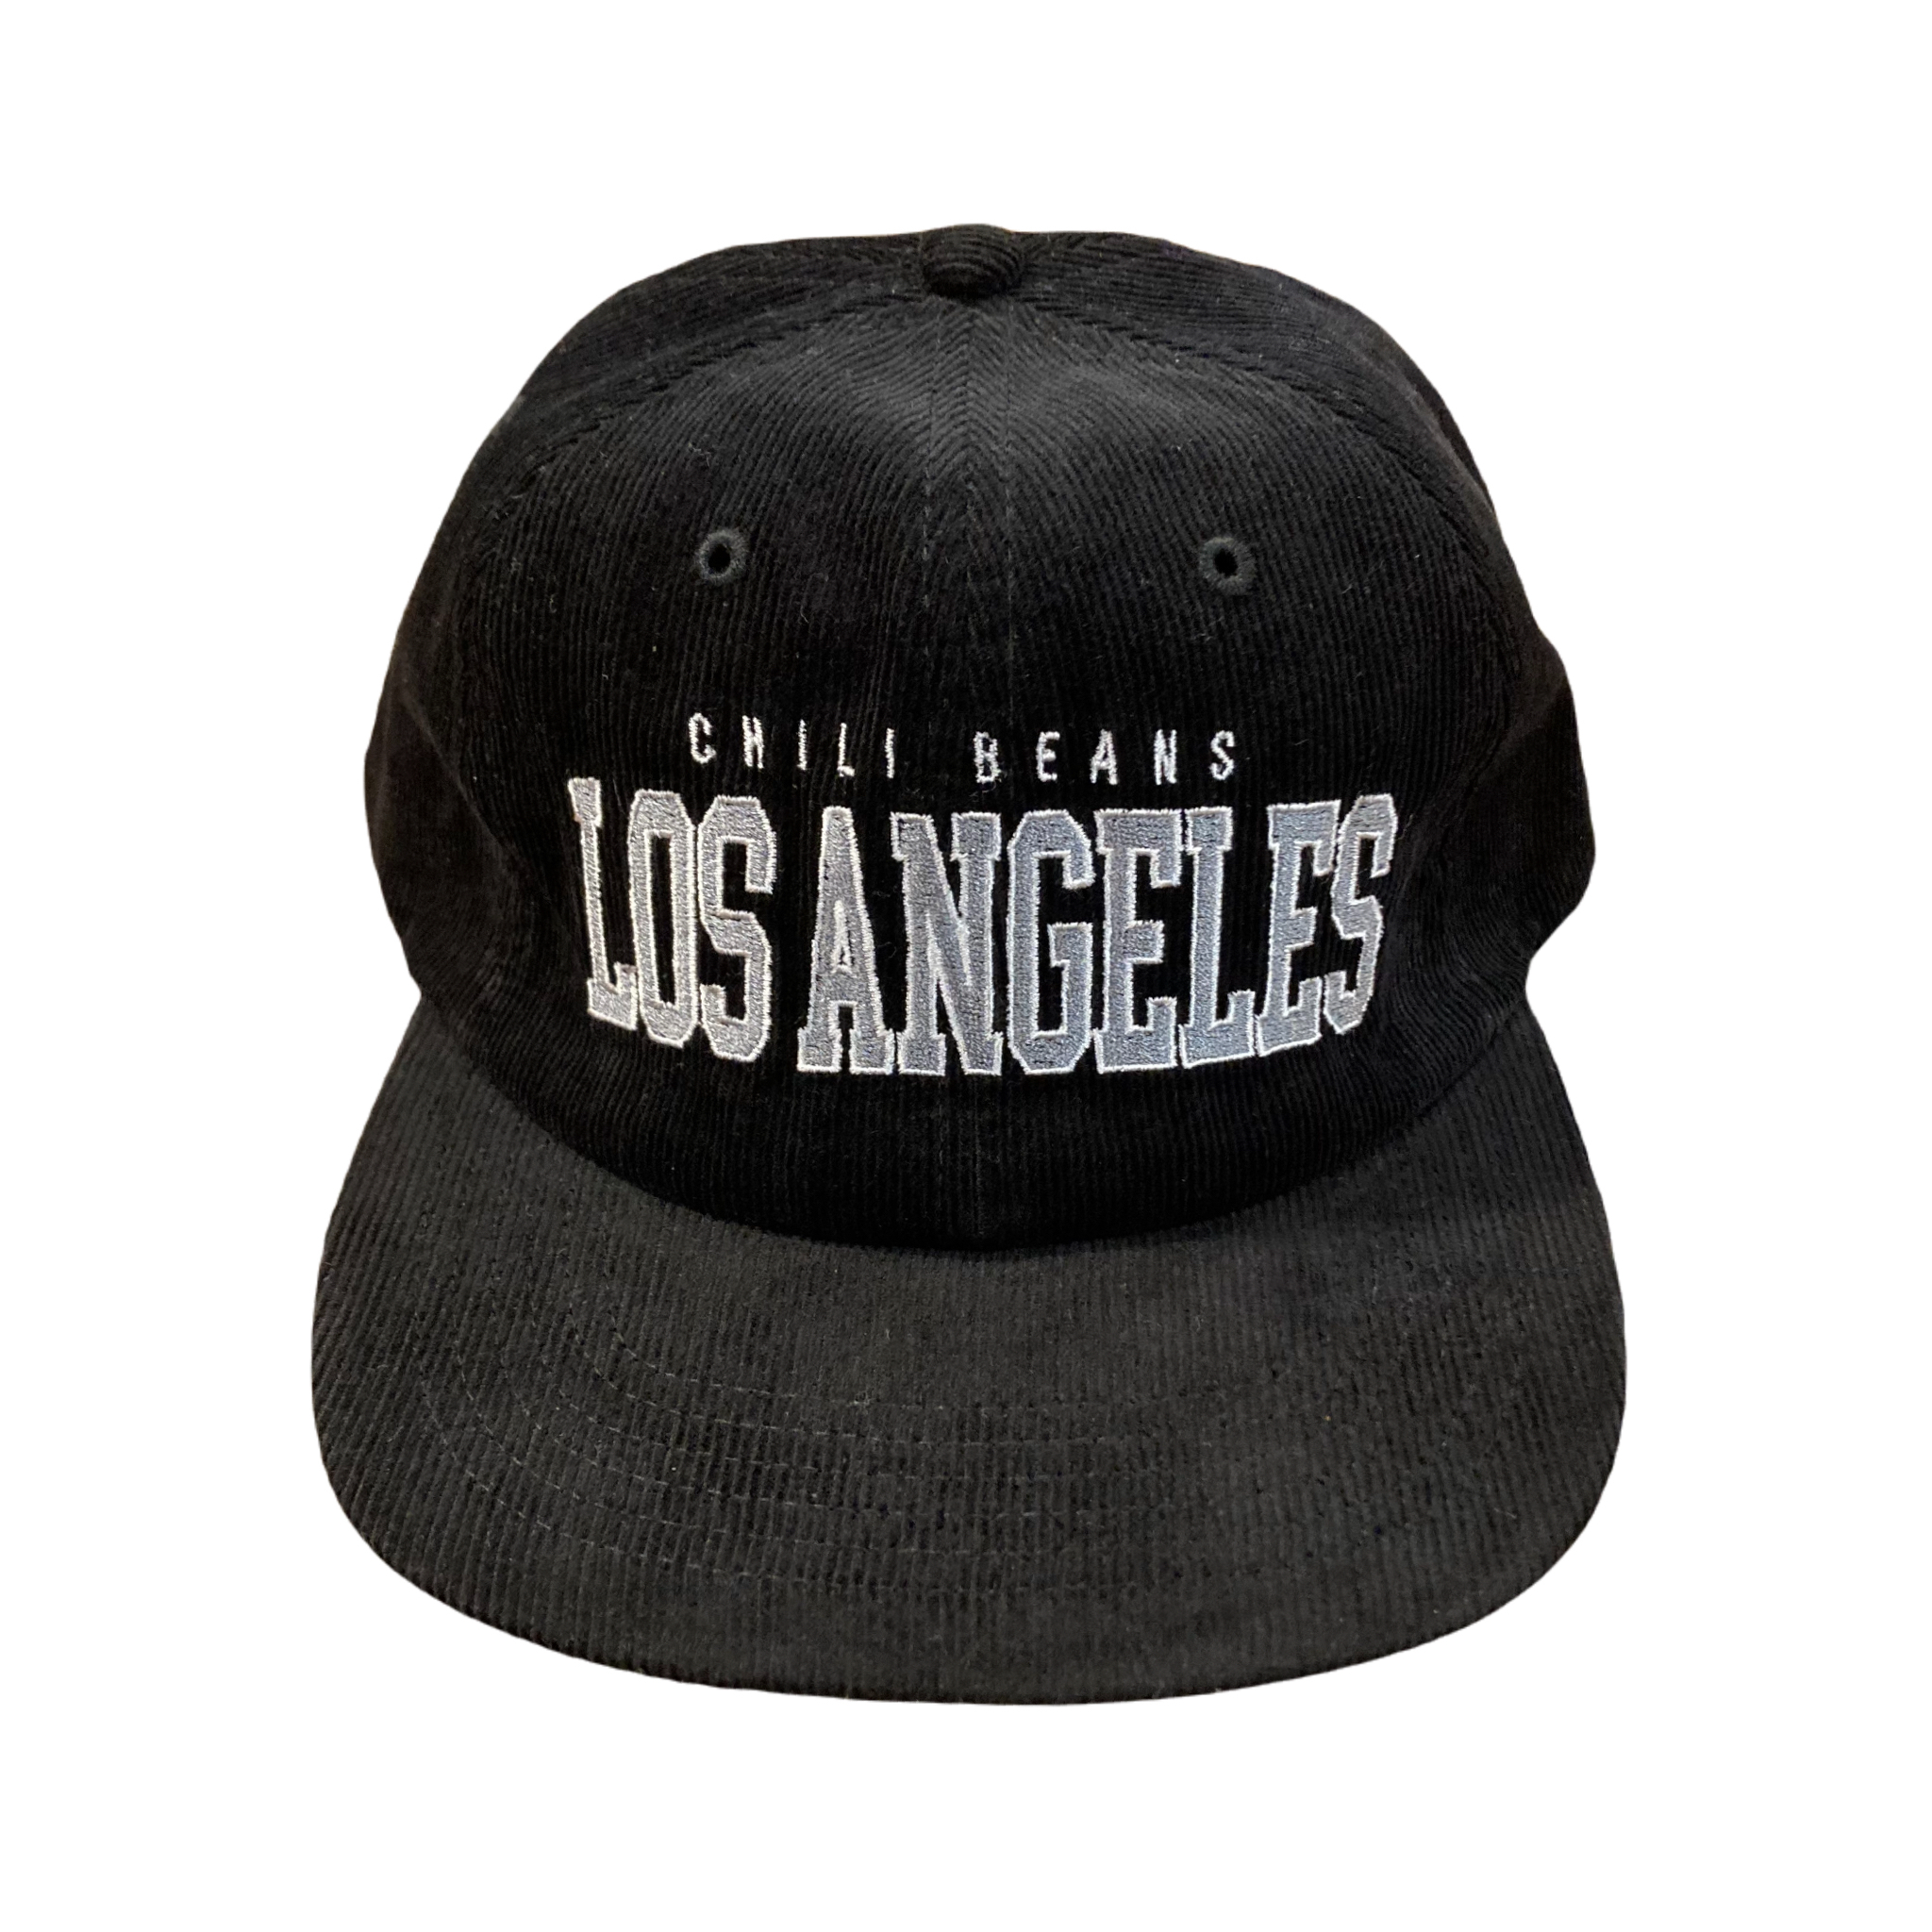 CHILI BEANS #Los Angeles Corduroy Cap